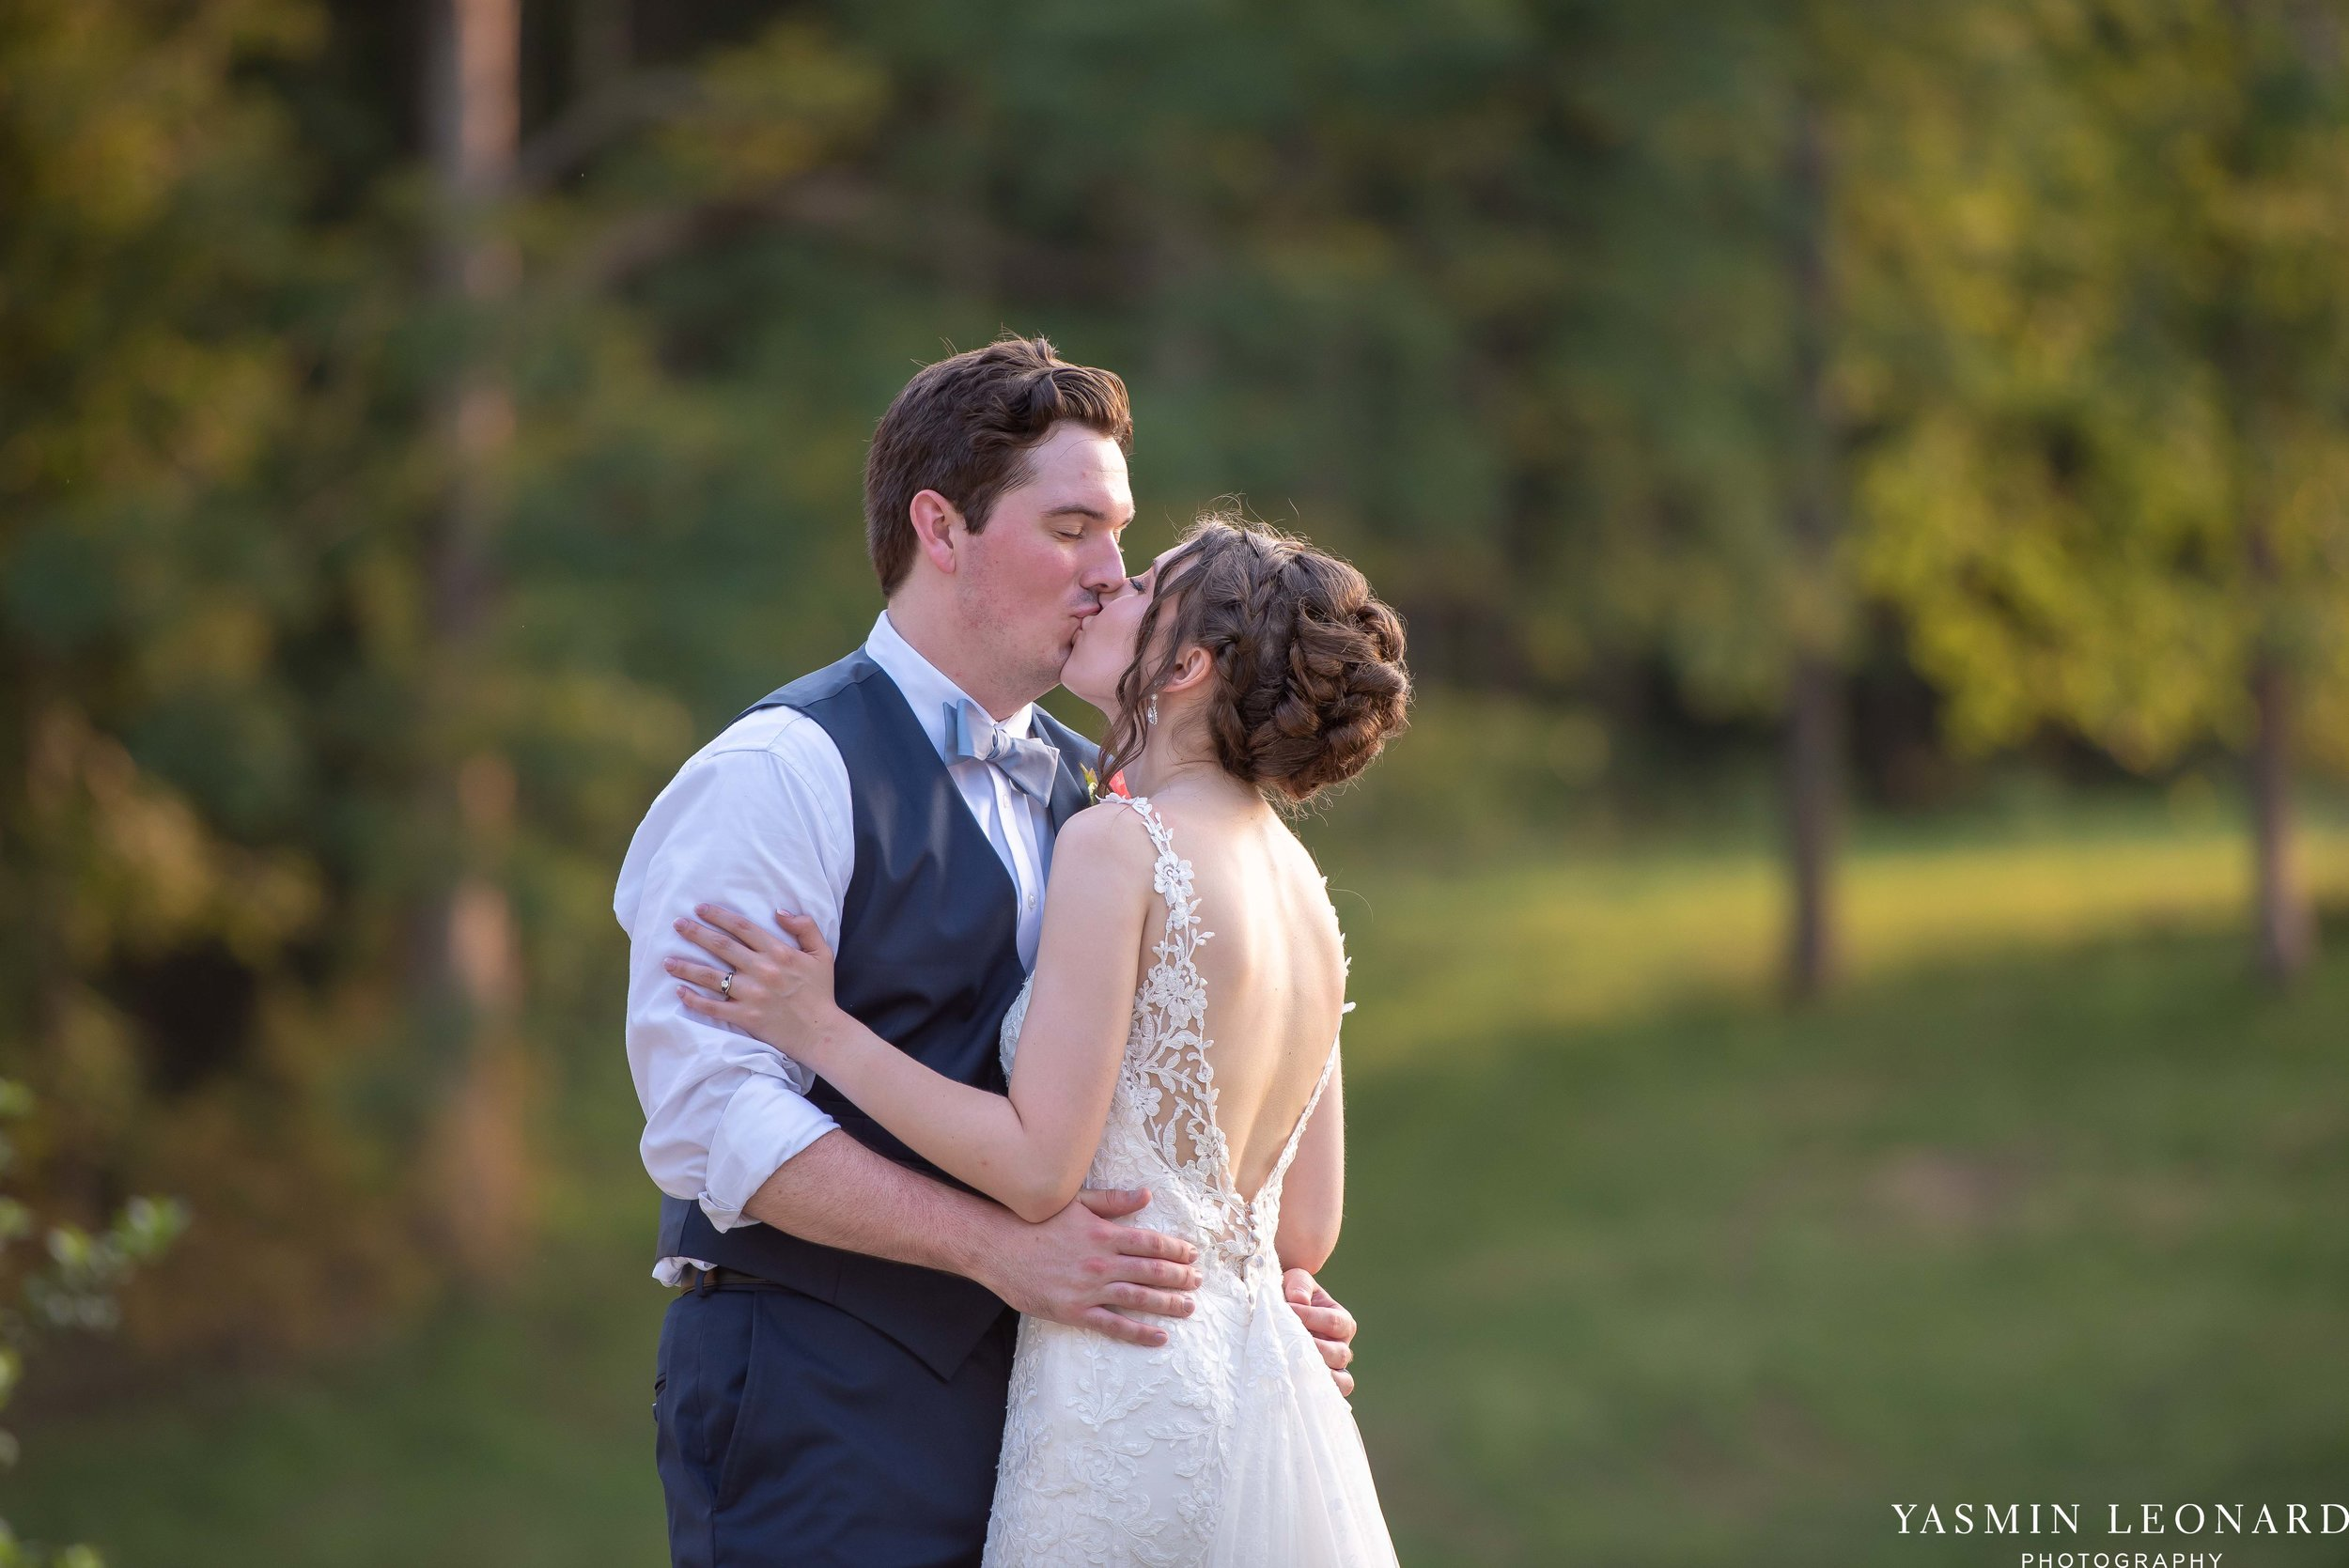 Old Homeplace Vineyard - NC Weddings - Outdoor Summer Weddings - Peony Boutique - Vineyard Wedding - NC Photographer - Yasmin Leonard Photography-63.jpg